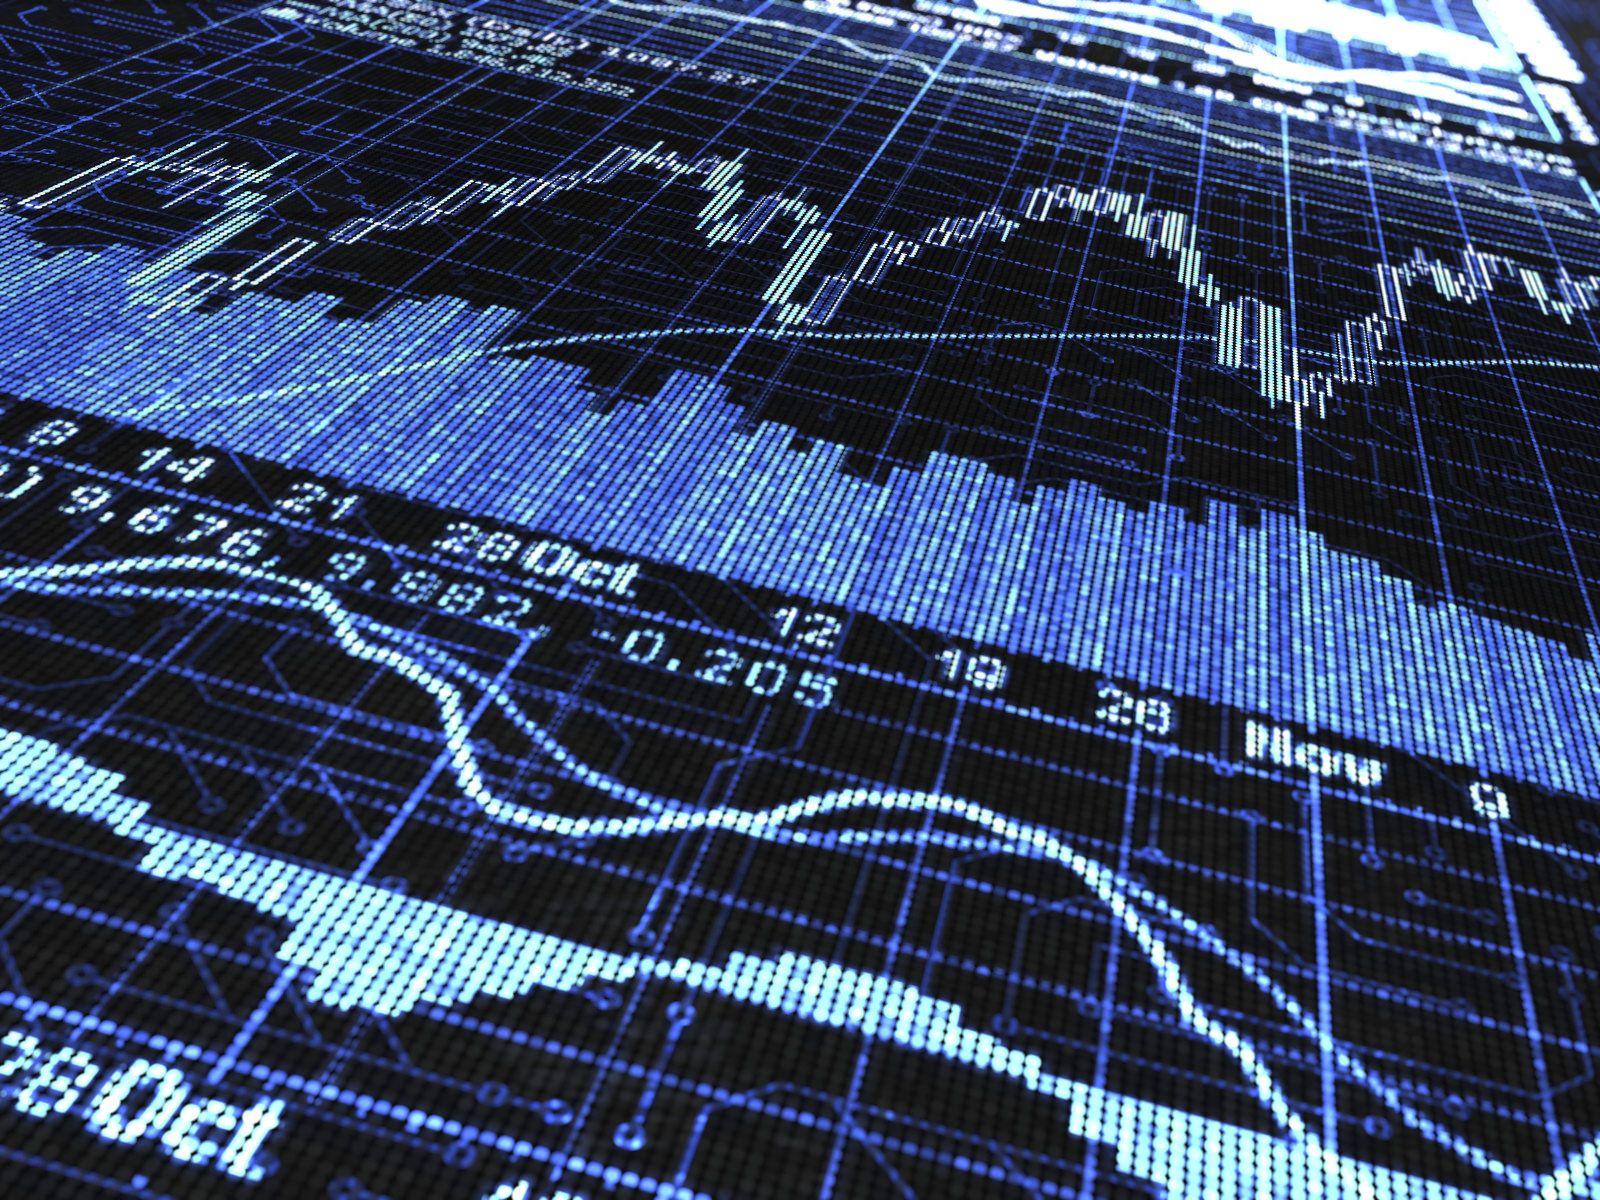 nasdaq stock market new york wallpapers hd wallpapers | hd